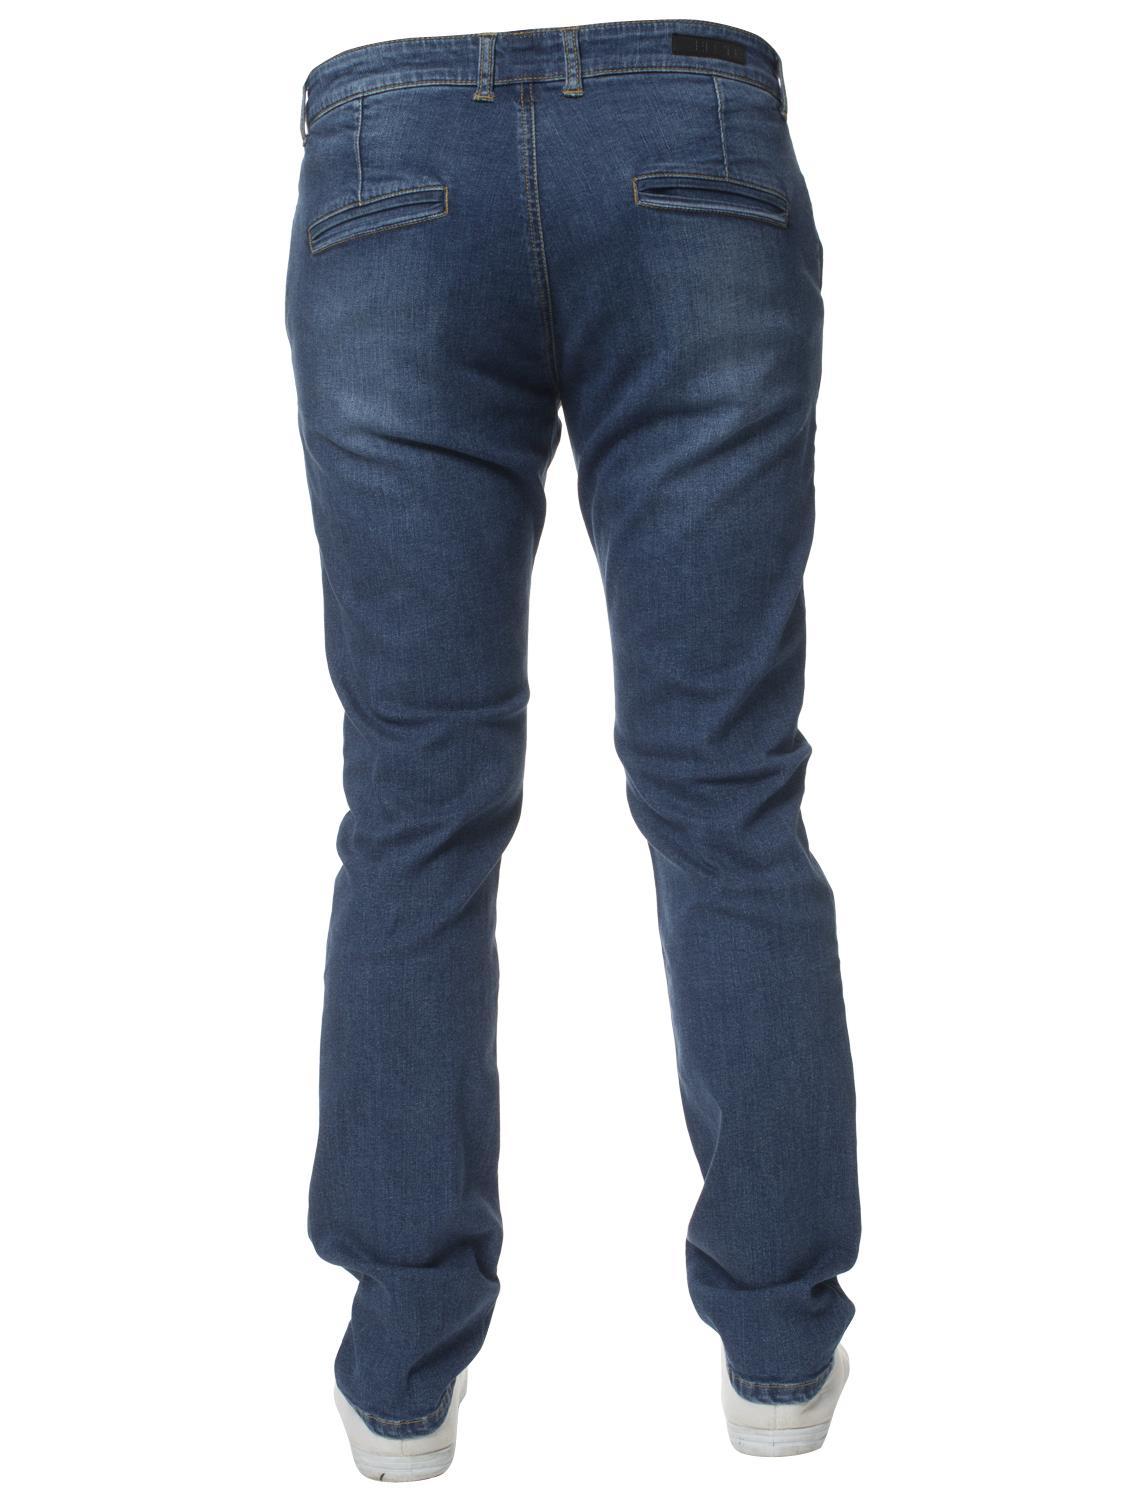 Enzo-Mens-Big-Tall-Jeans-Leg-King-Size-Denim-Pants-Chino-Trousers-Pants-44-034-60-034 thumbnail 33